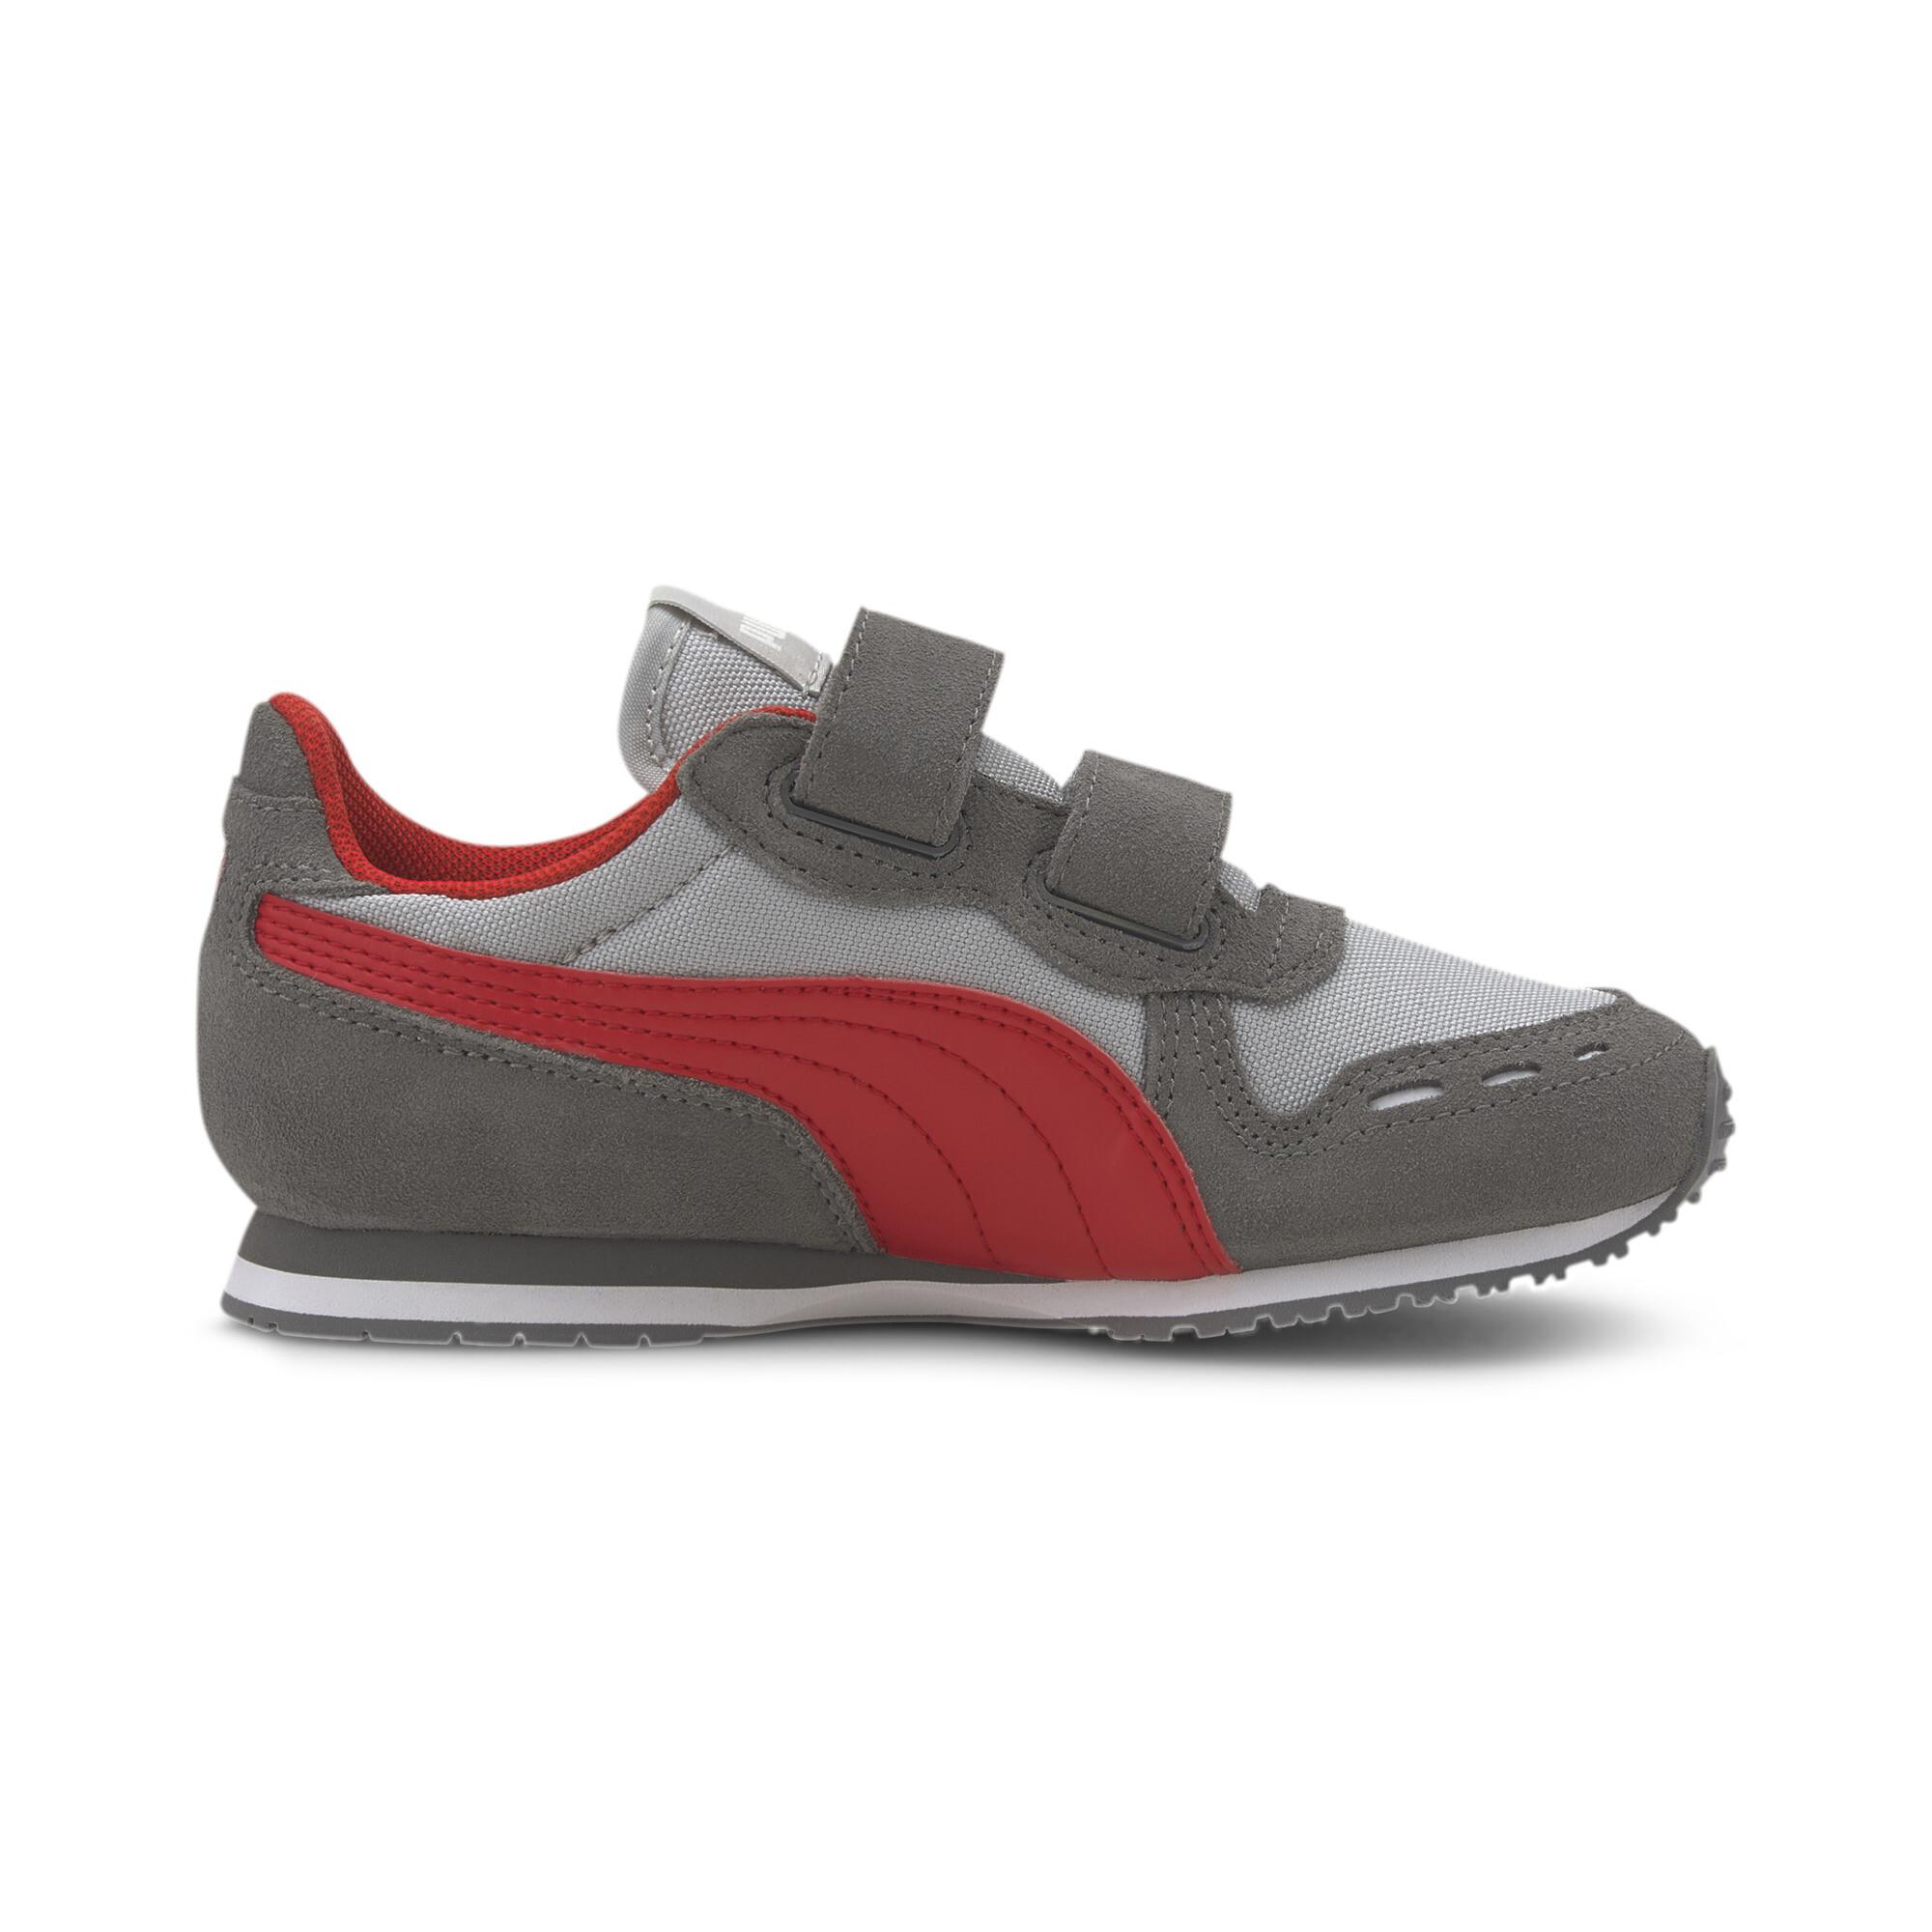 PUMA-Cabana-Racer-Little-Kids-039-Shoes-Kids-Shoe-Kids thumbnail 29